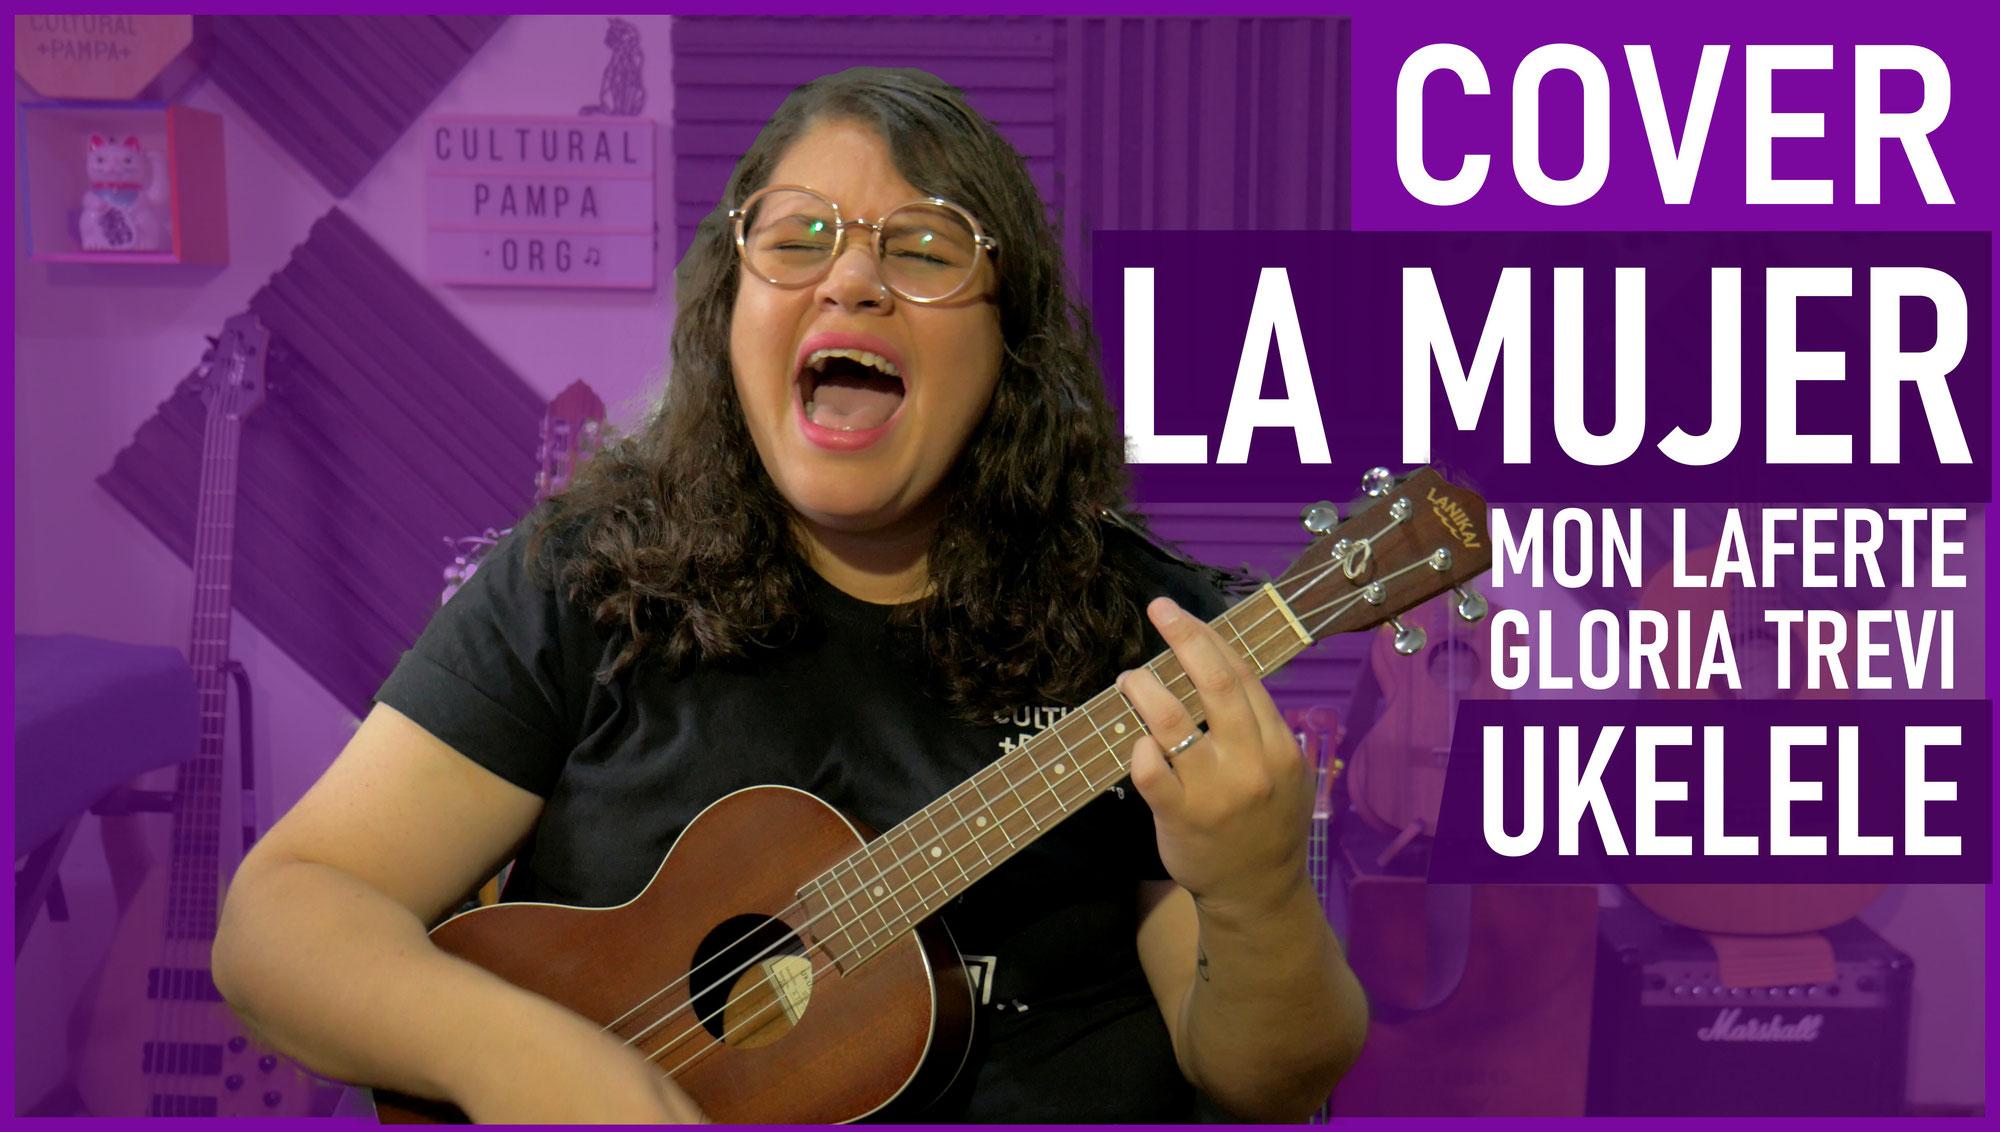 La Mujer (Mon Laferte, Gloria Trevi) | Cover Ukelele